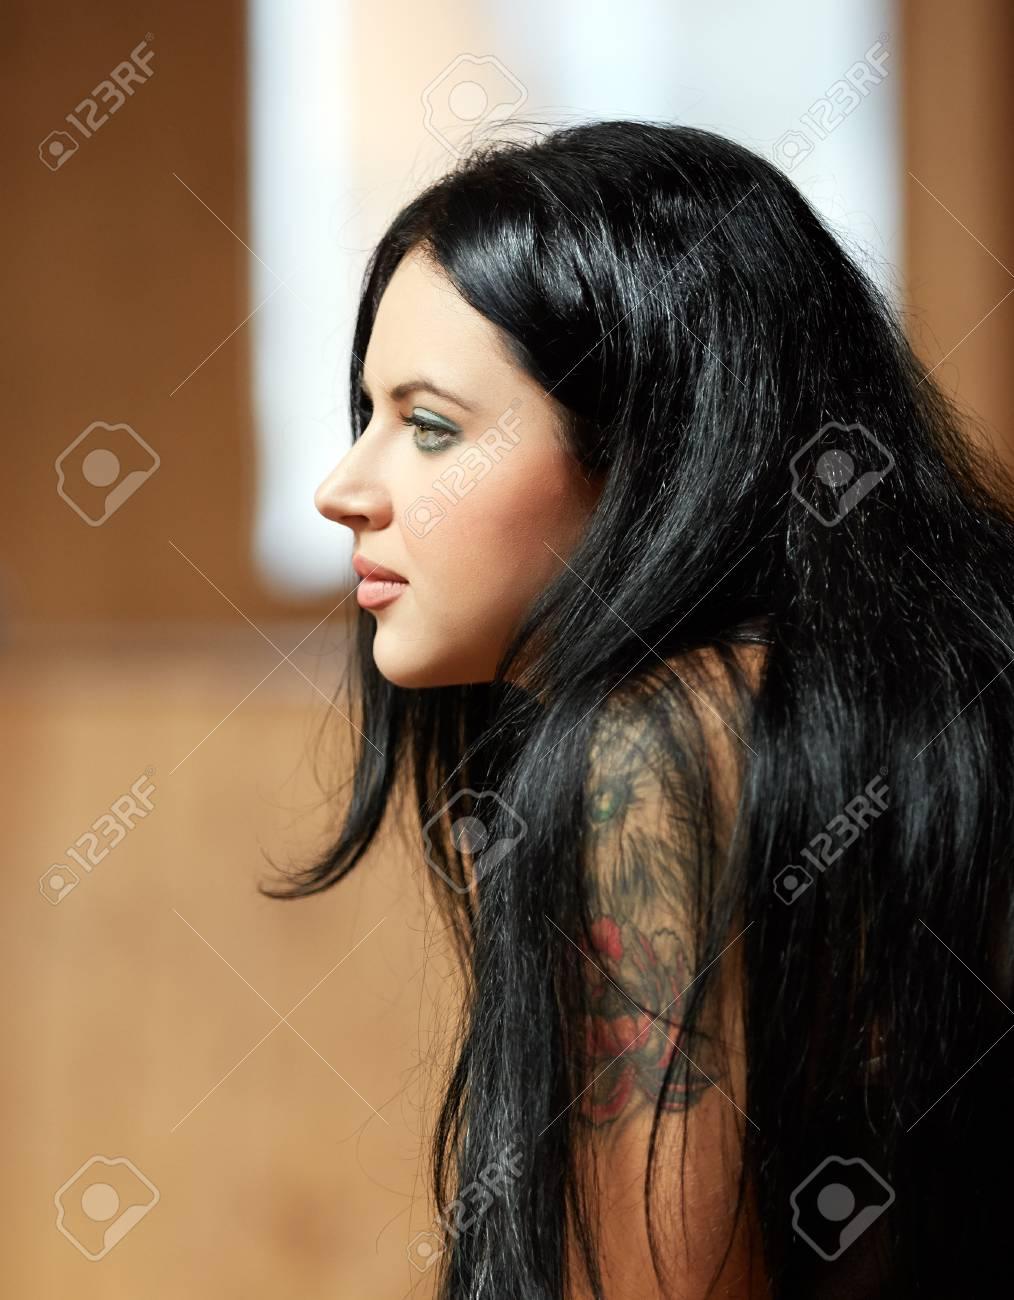 Frau profilbild LOVOO Einloggen